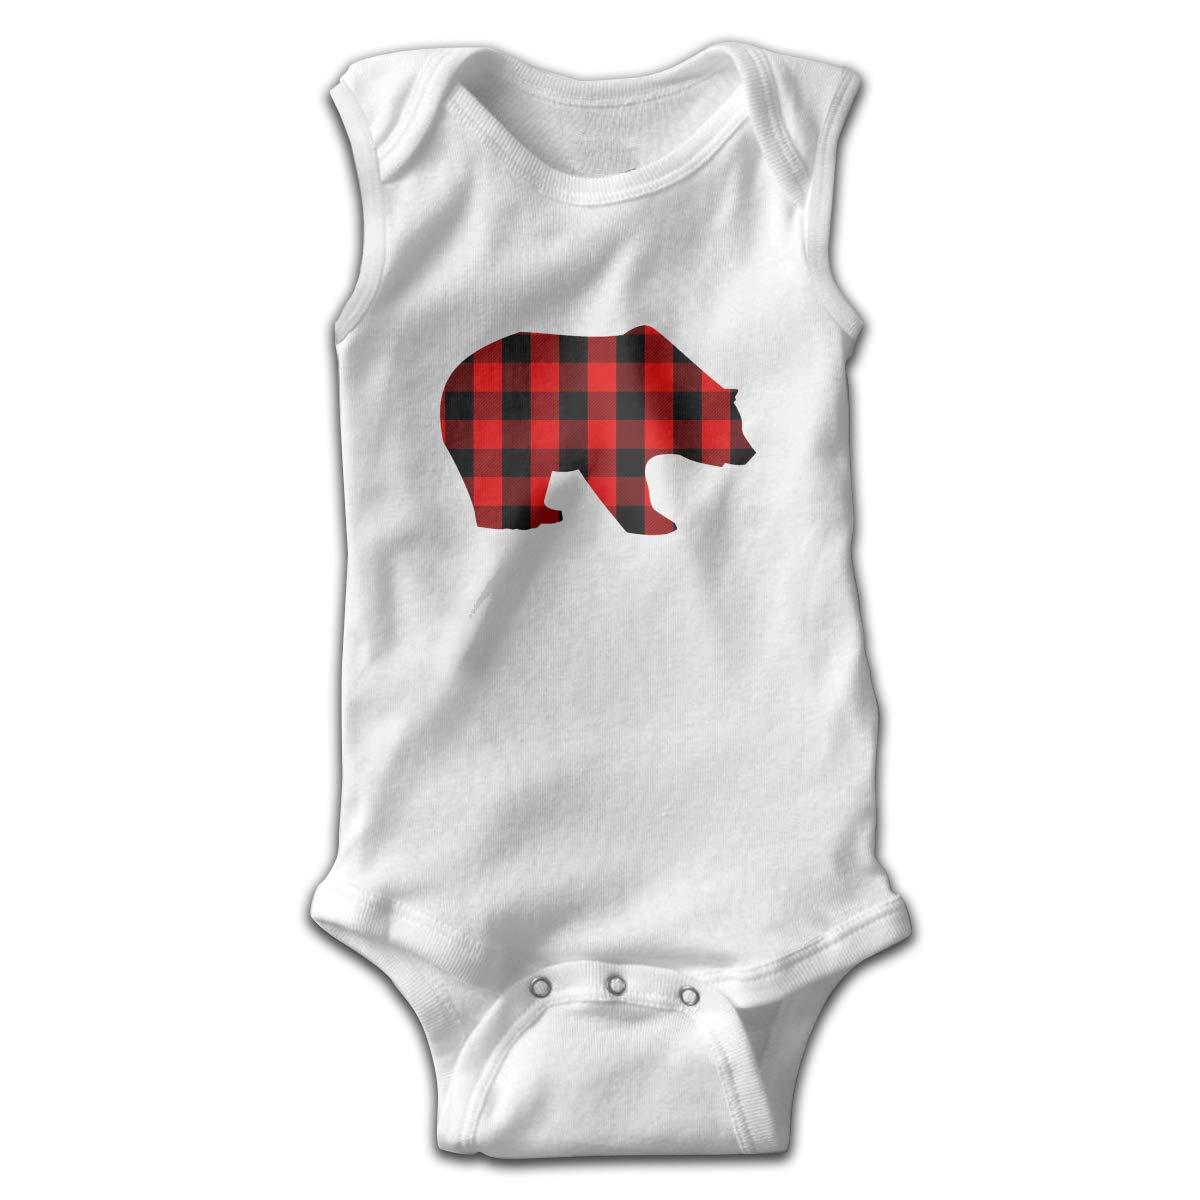 Red Buffalo Plaid Bear Newborn Crawling Suit Sleeveless Romper Bodysuit Onesies Jumpsuit Black